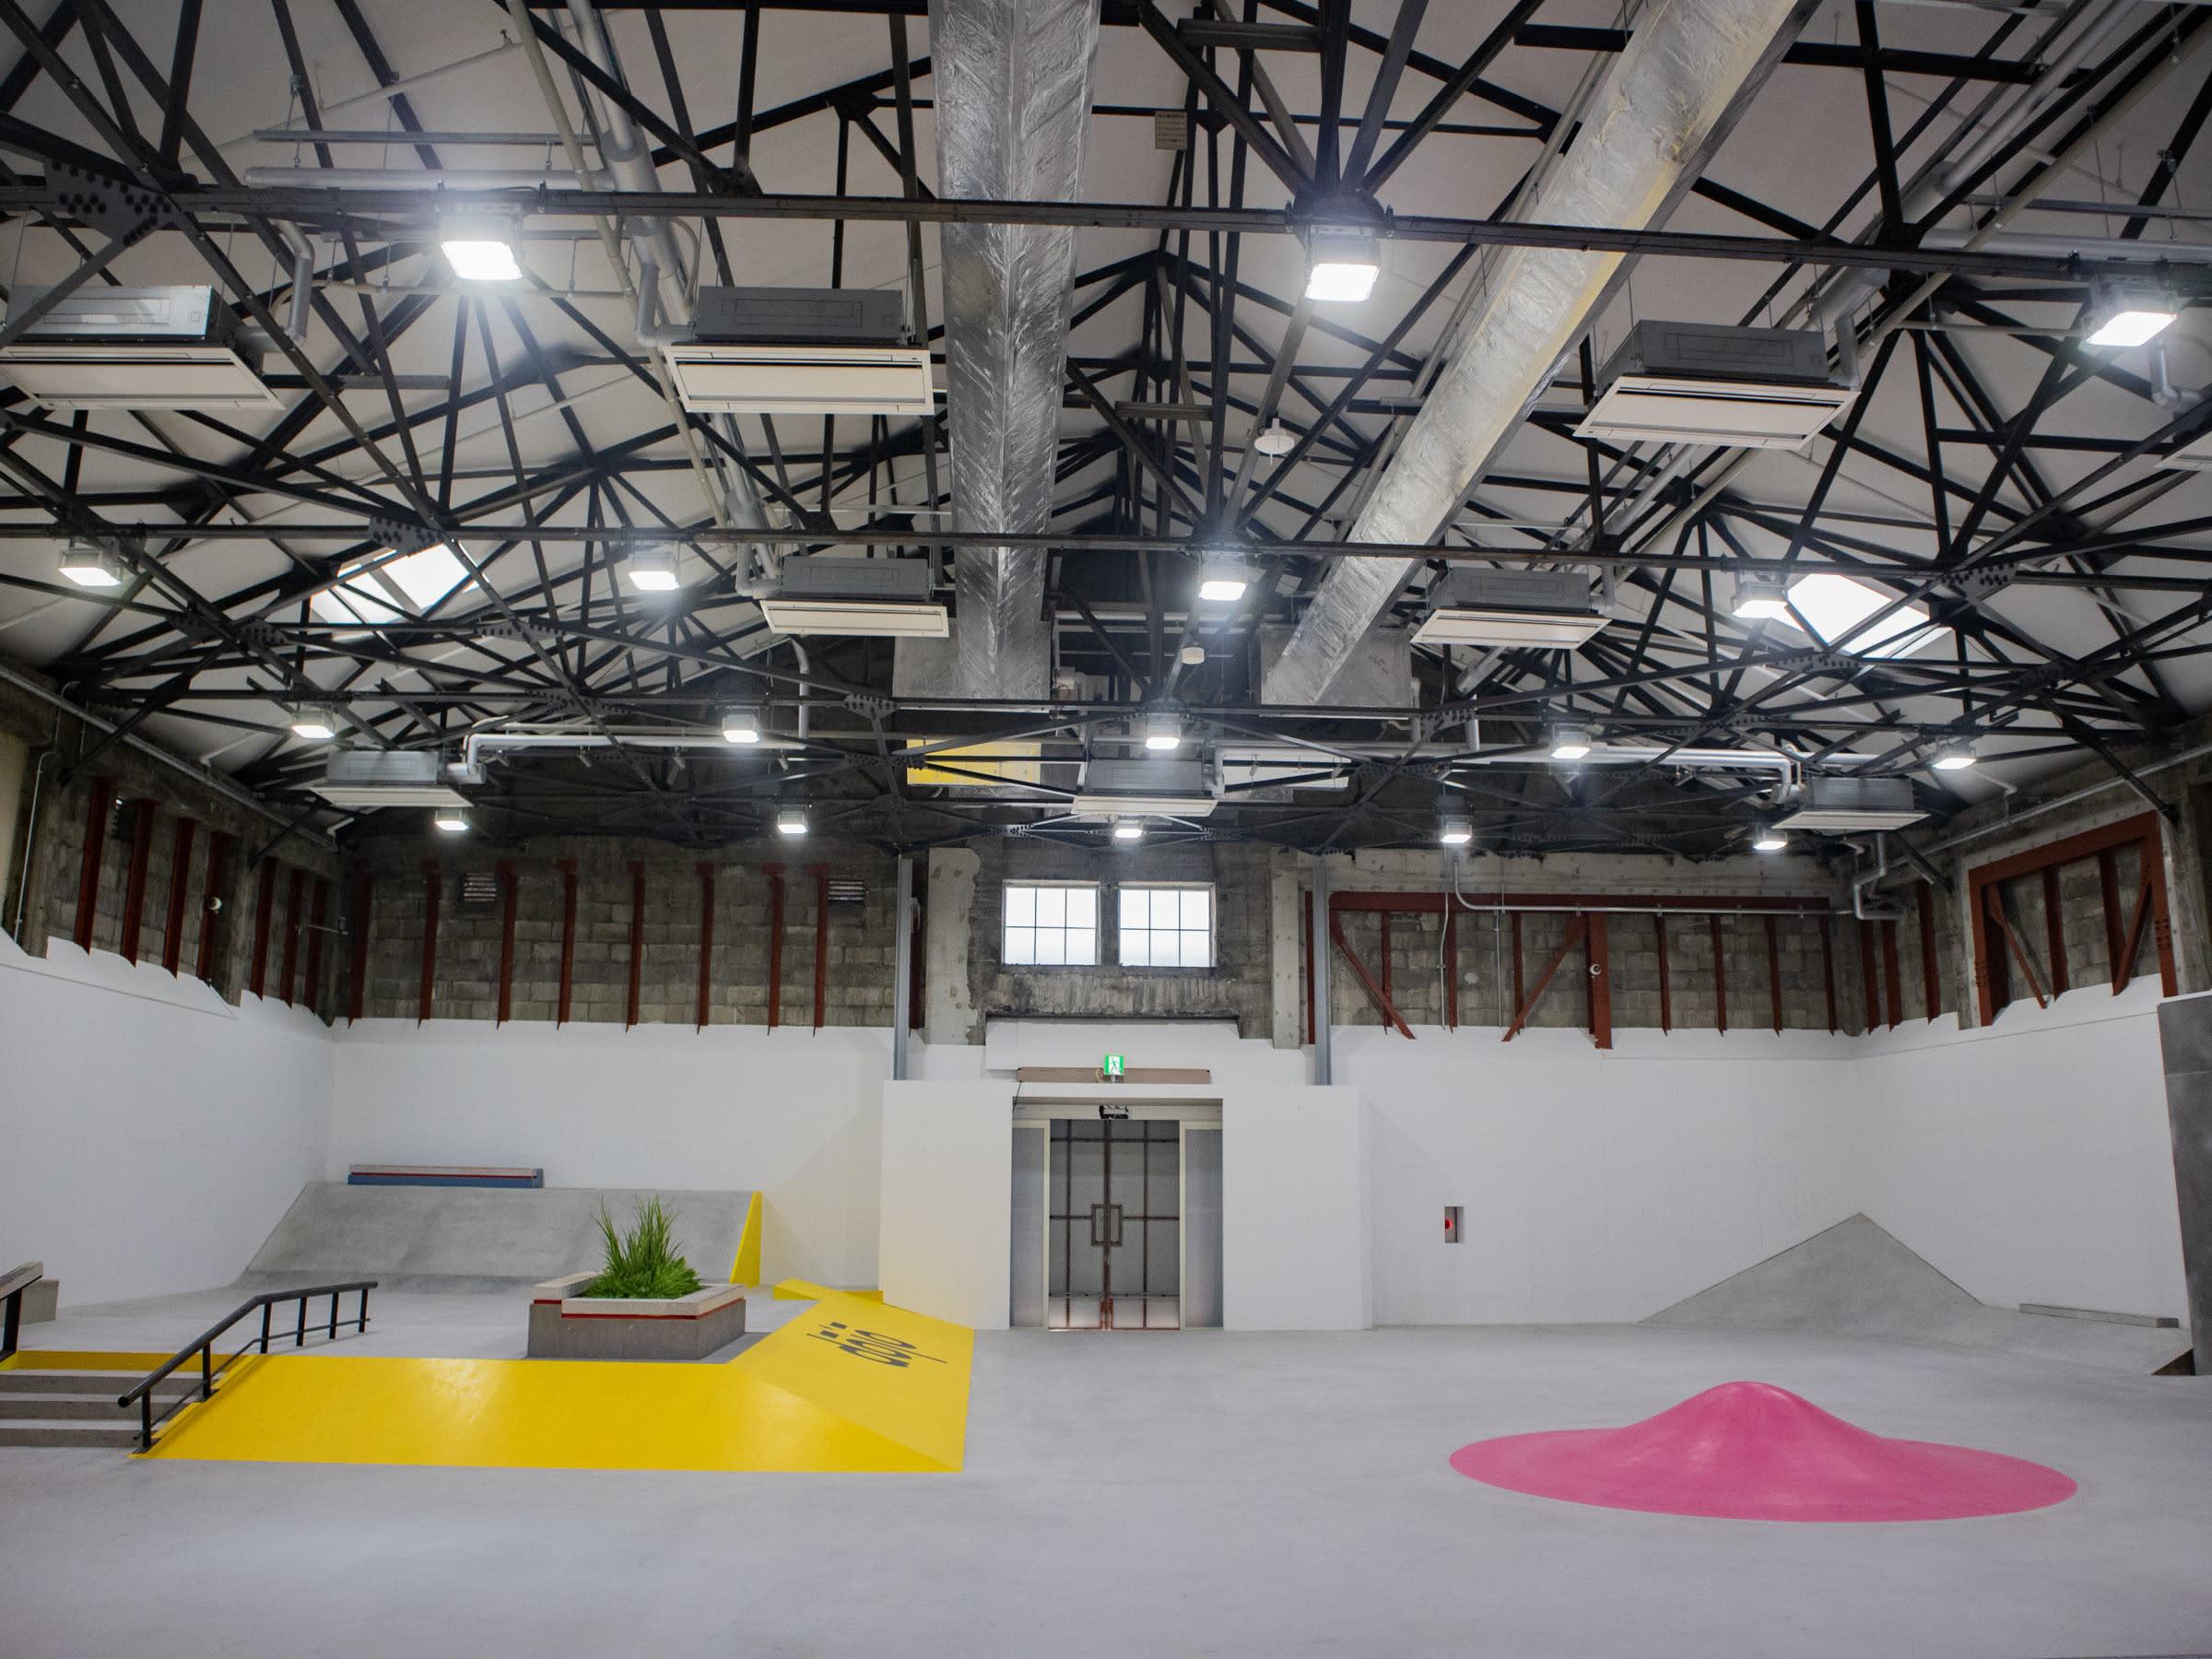 d20df4fe5b58e ナイキ SBのスケートパーク「Nike SB dojo」でスケートコミュニティーを ...